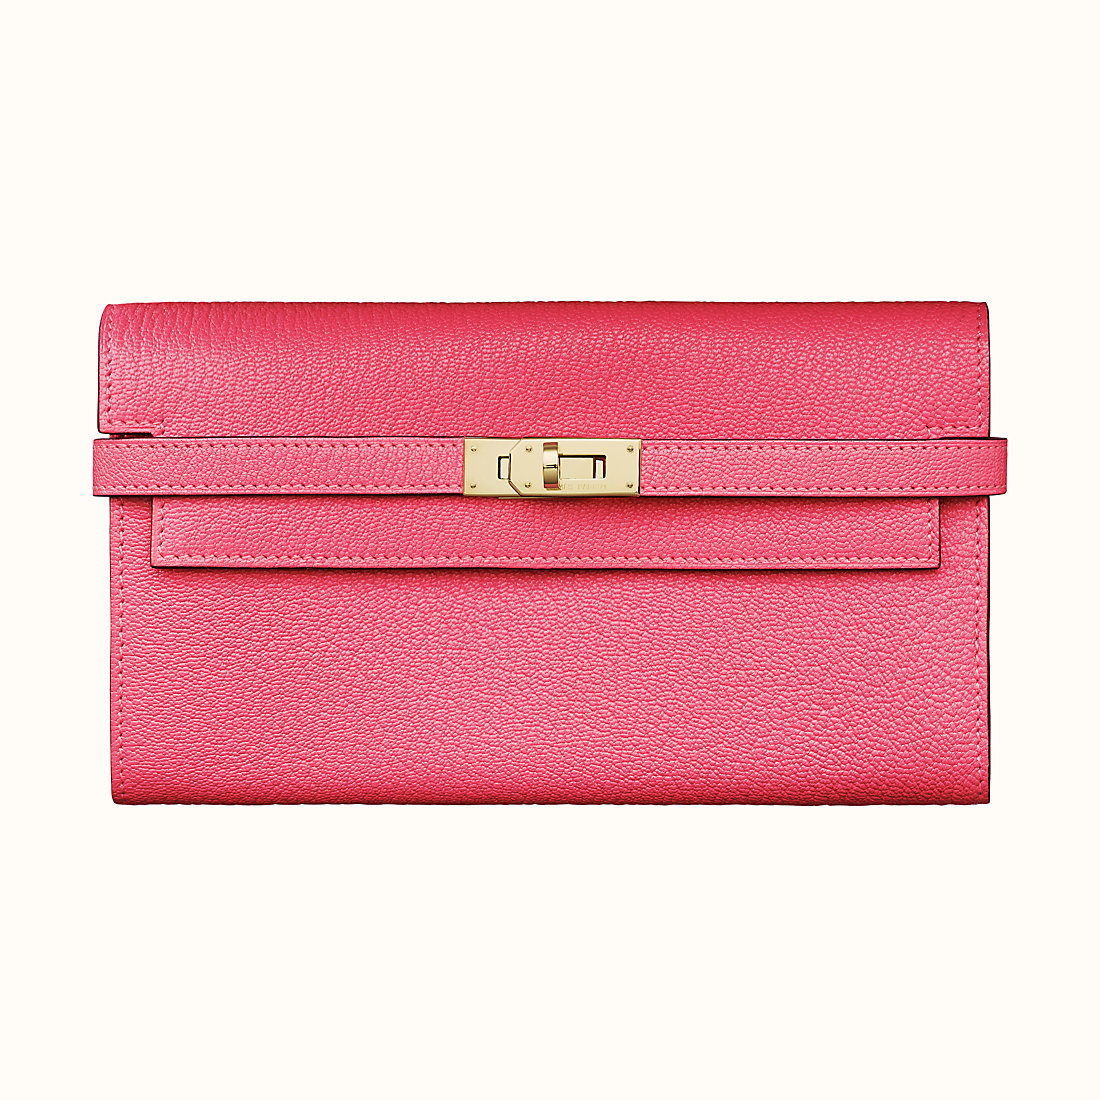 Hermes Kelly classic wallet CCU5 Rose Lipstick 唇膏粉 山羊皮